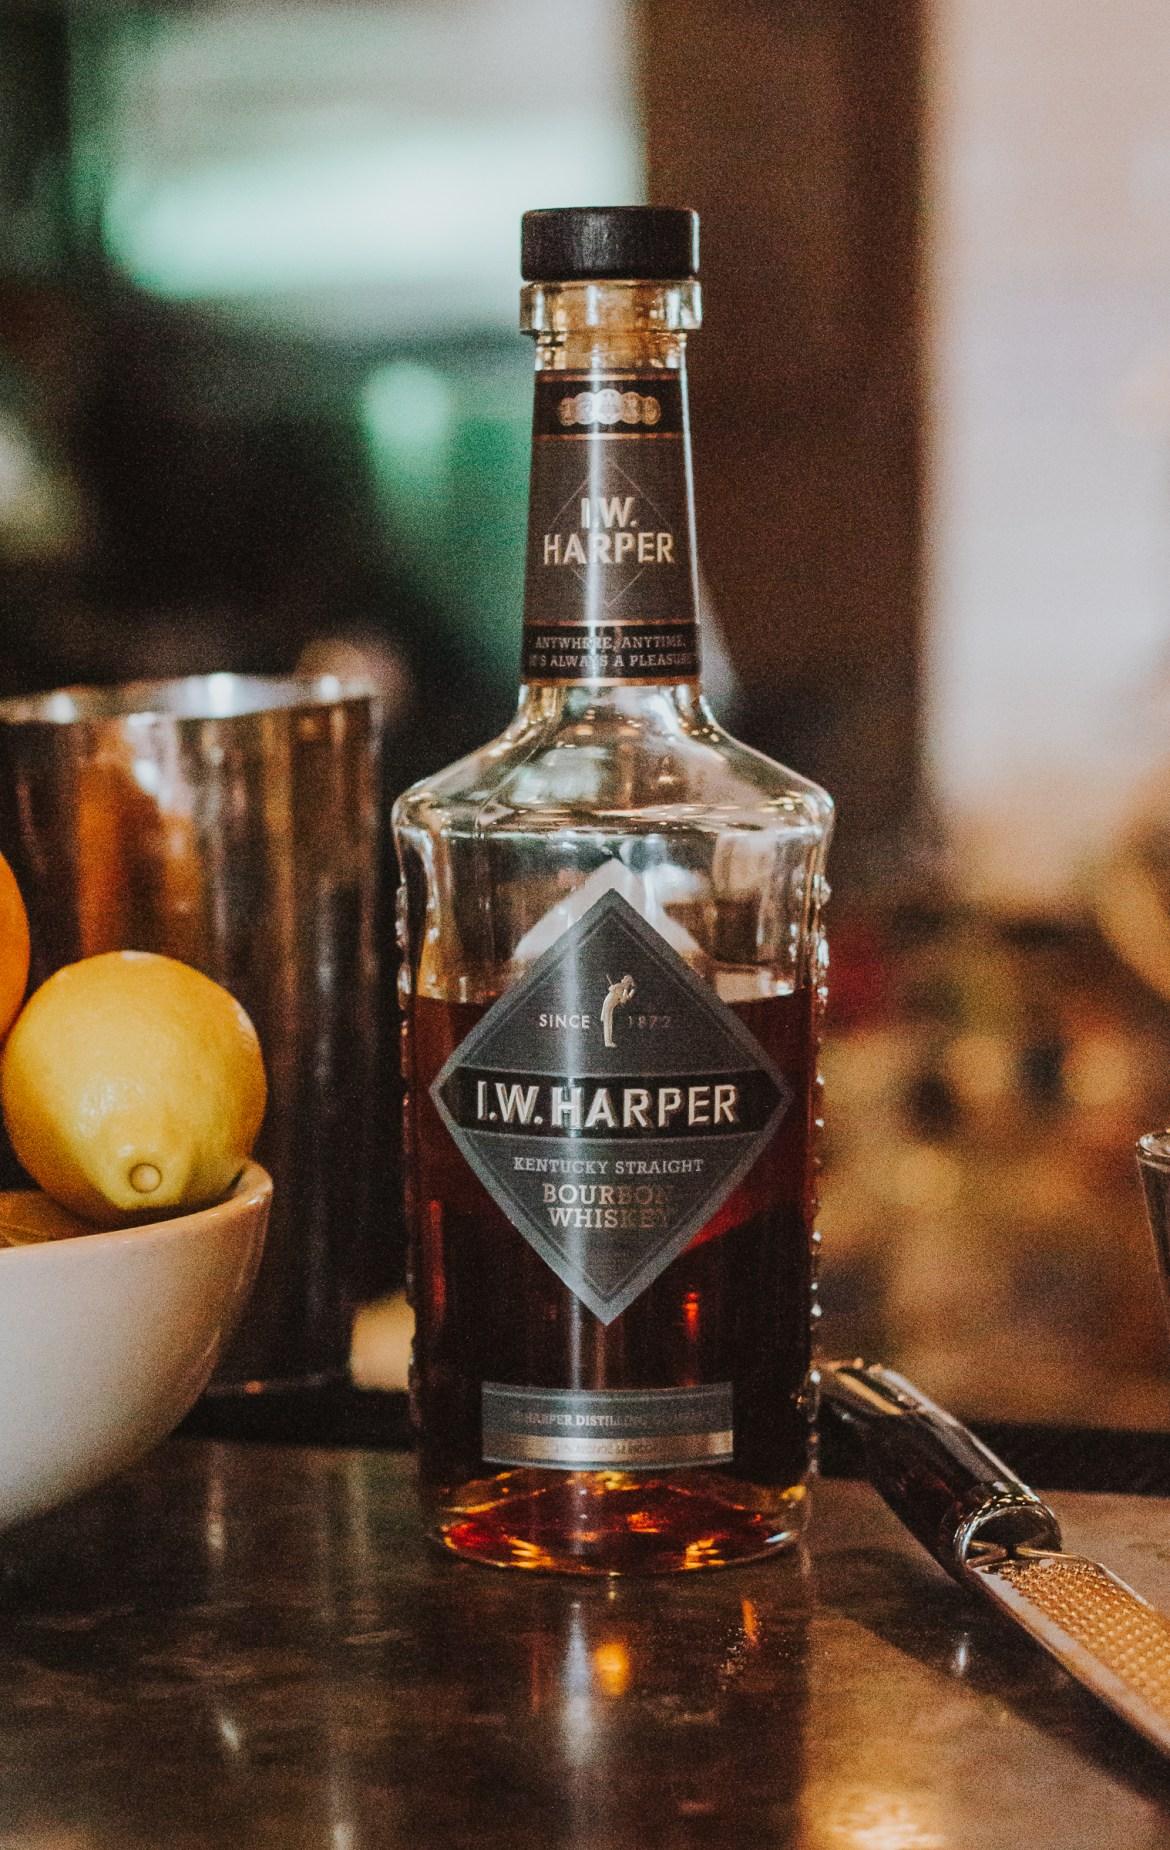 bourbon mixology, Doc Crow's Southern Smokehouse & Raw Bar, louisville kentucky bars, iw harper bourbon, bourbon cocktails